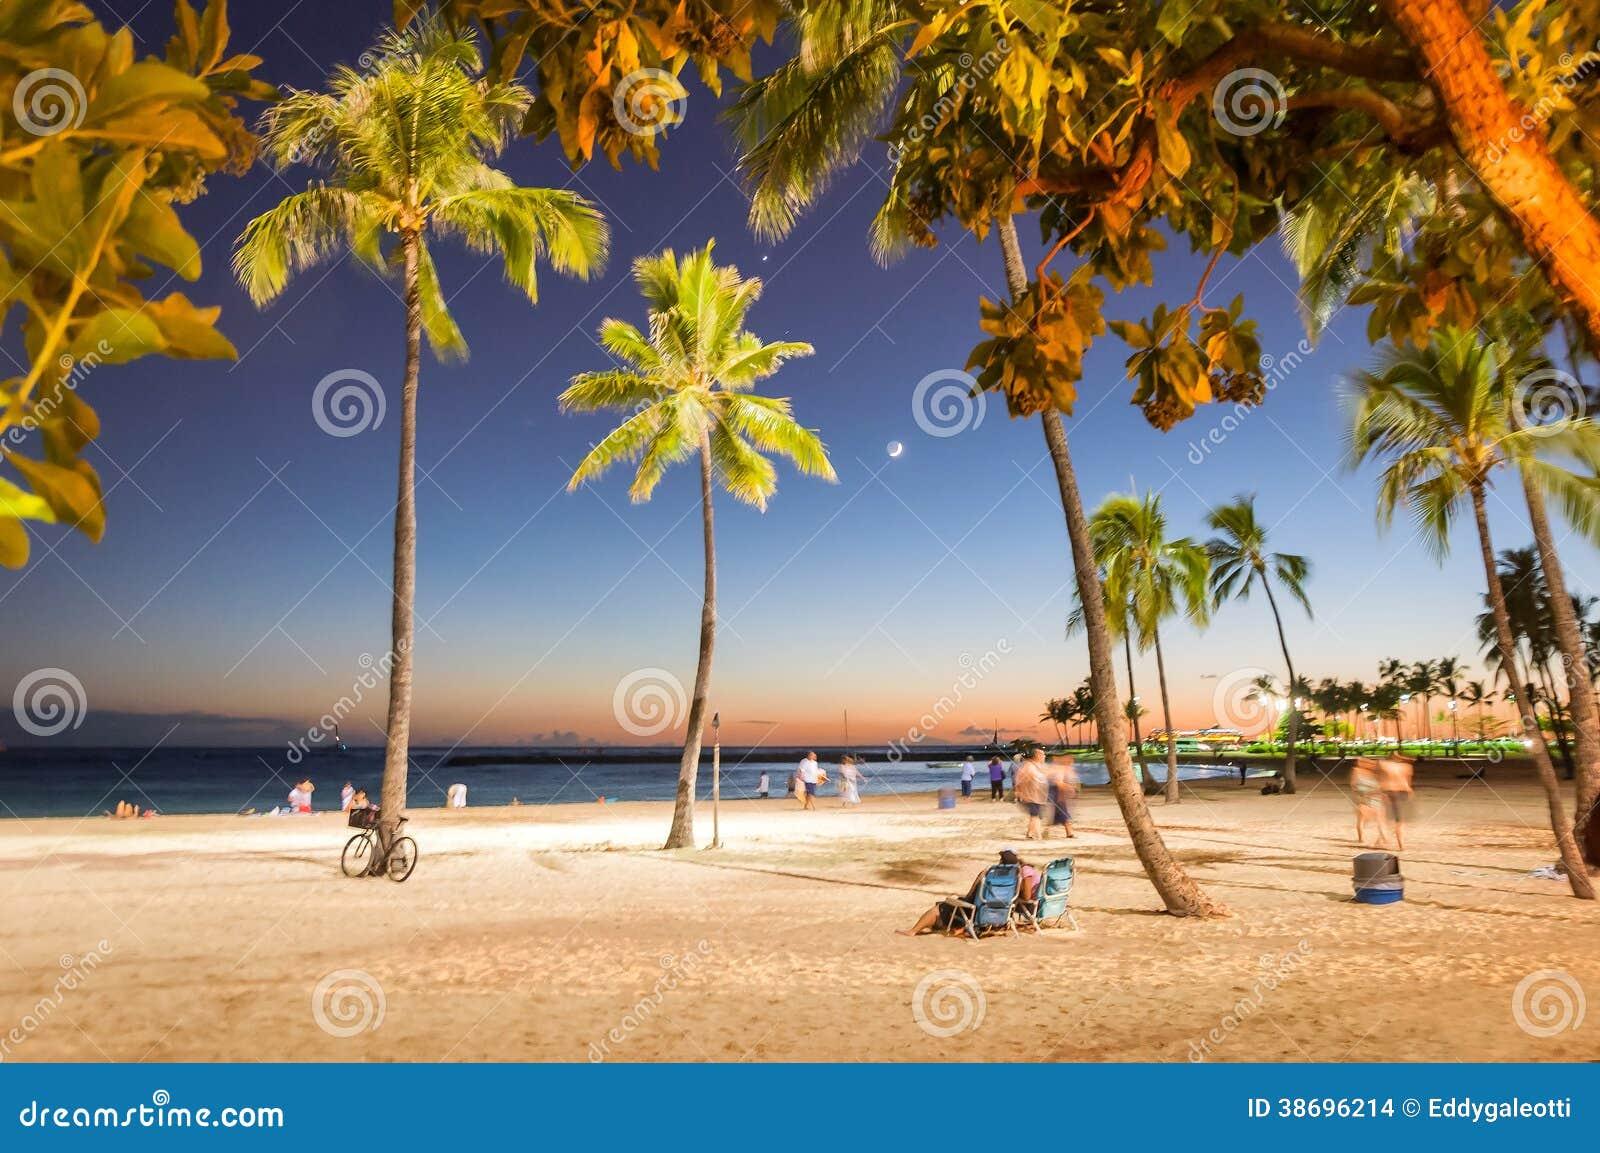 NELDA: Time in honolulu hawaii